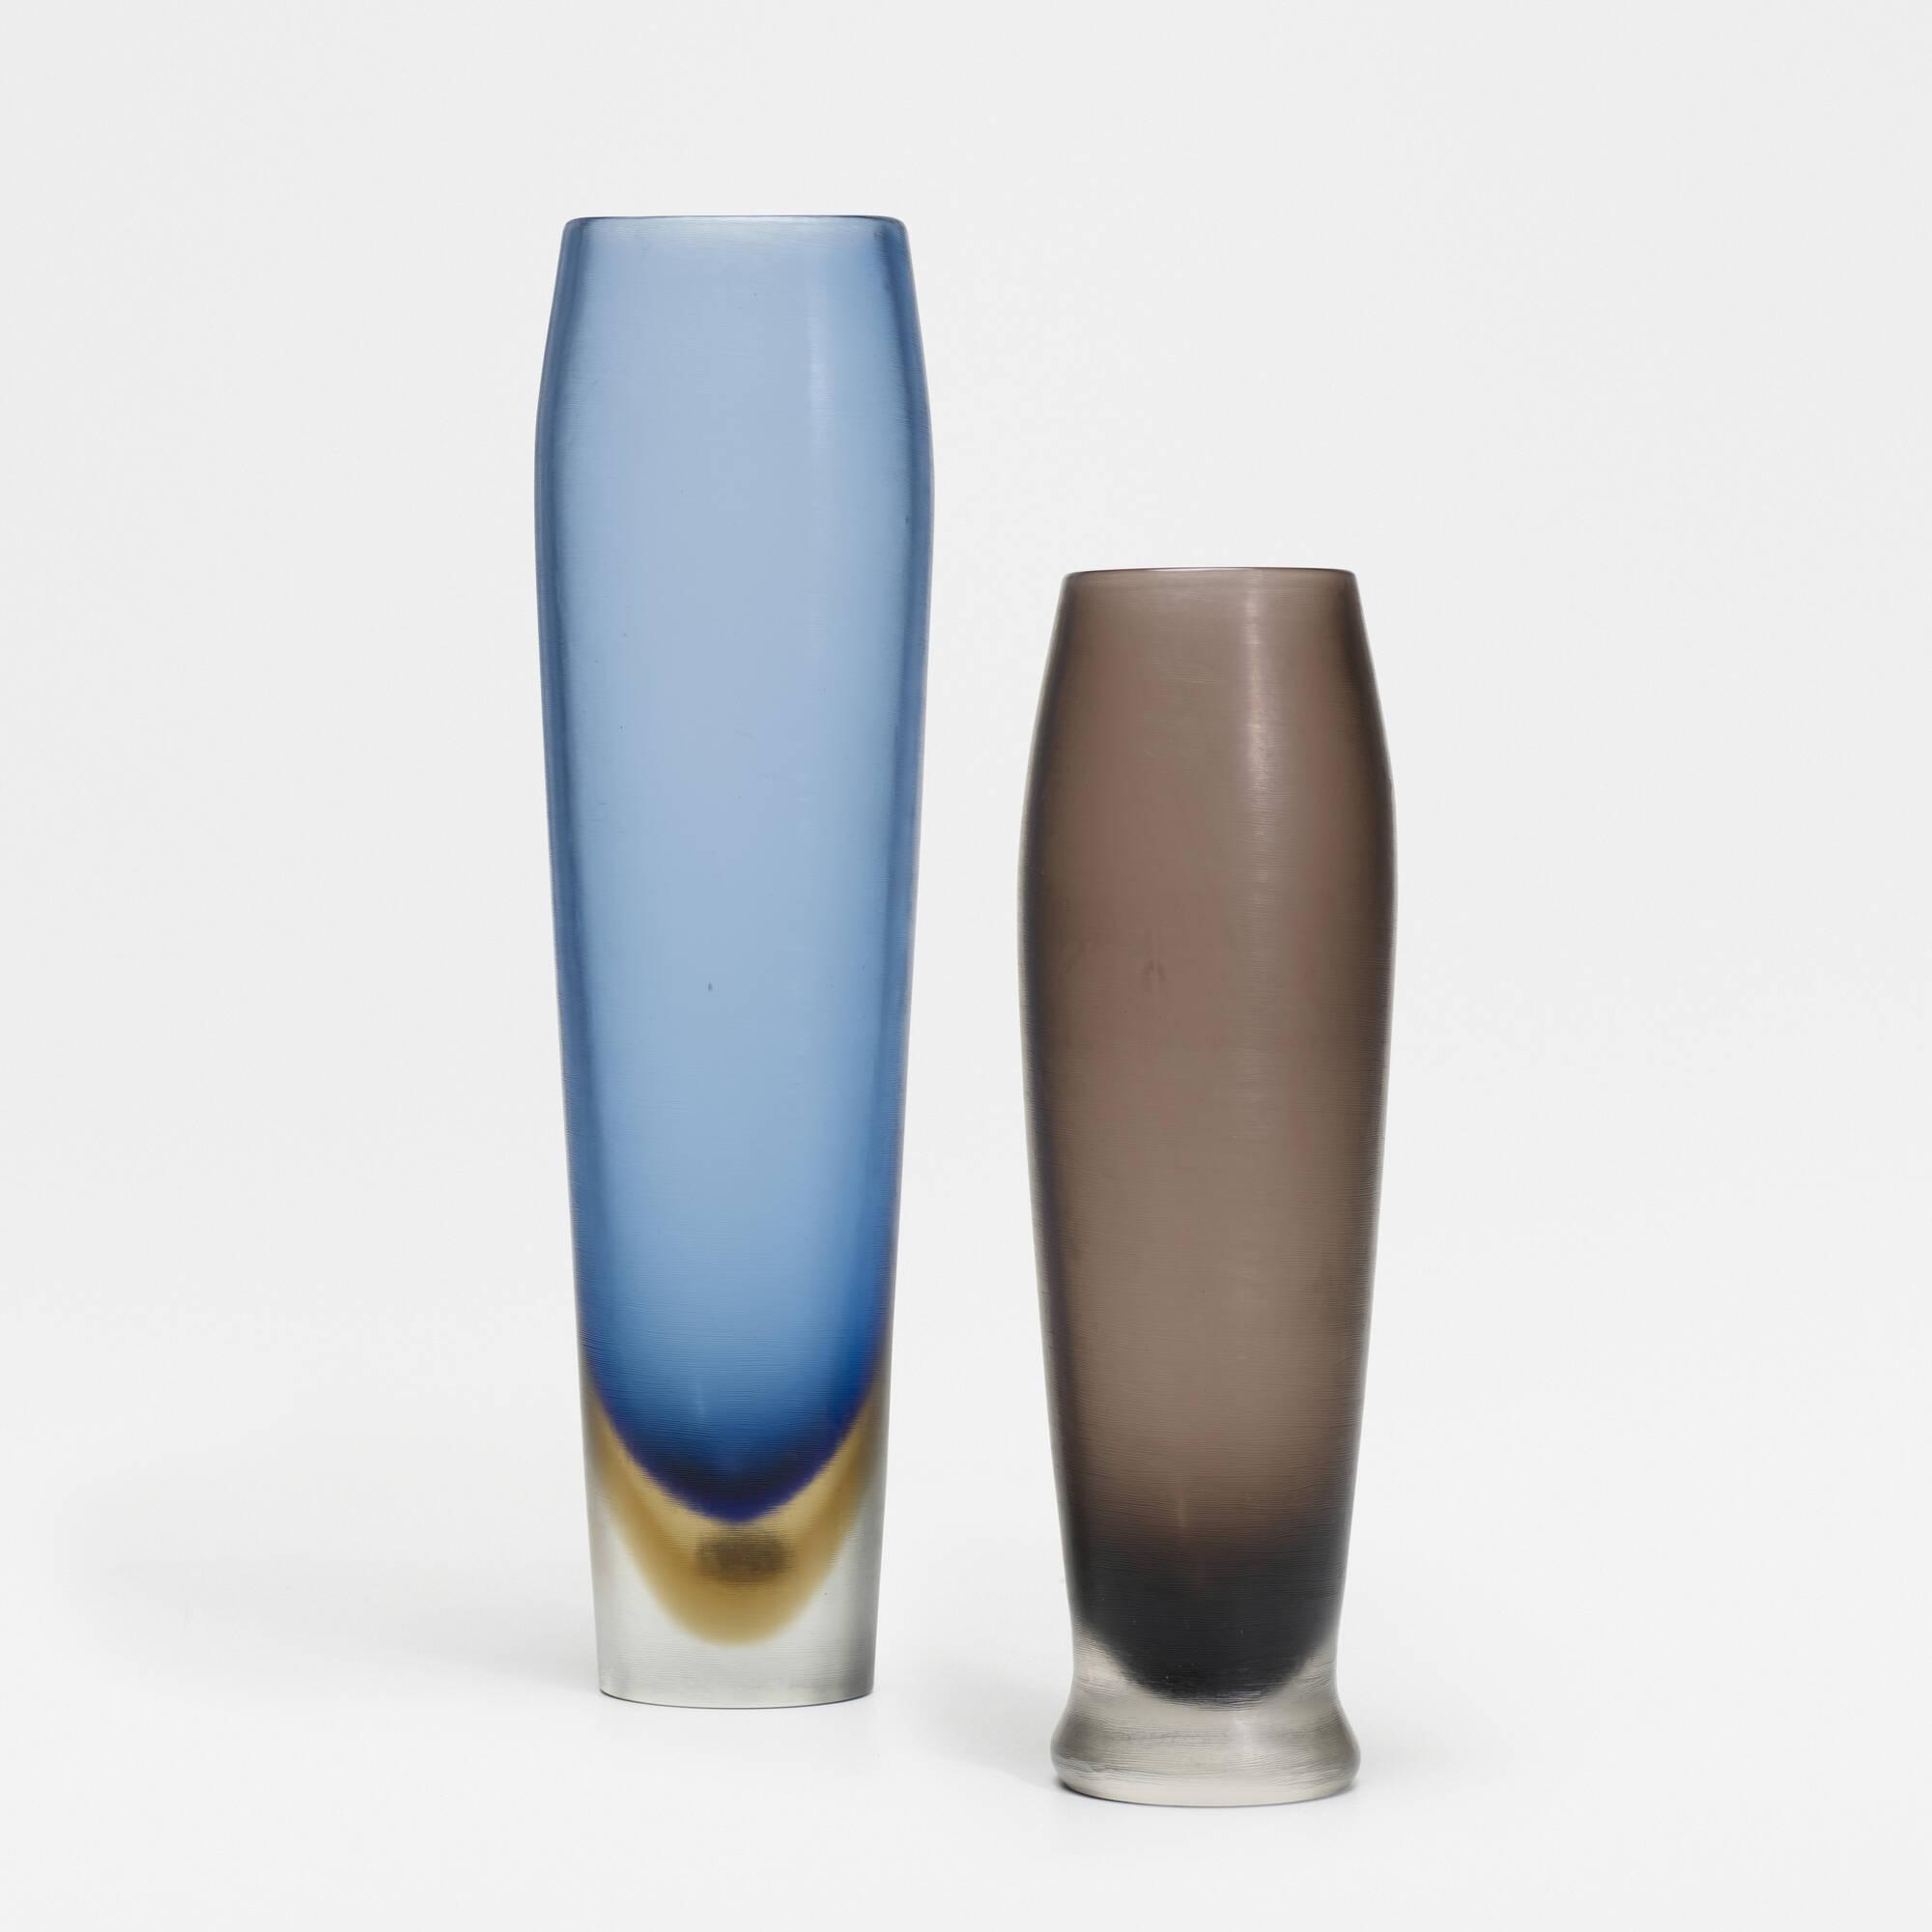 275: Paolo Venini / Inciso vases, pair (1 of 1)